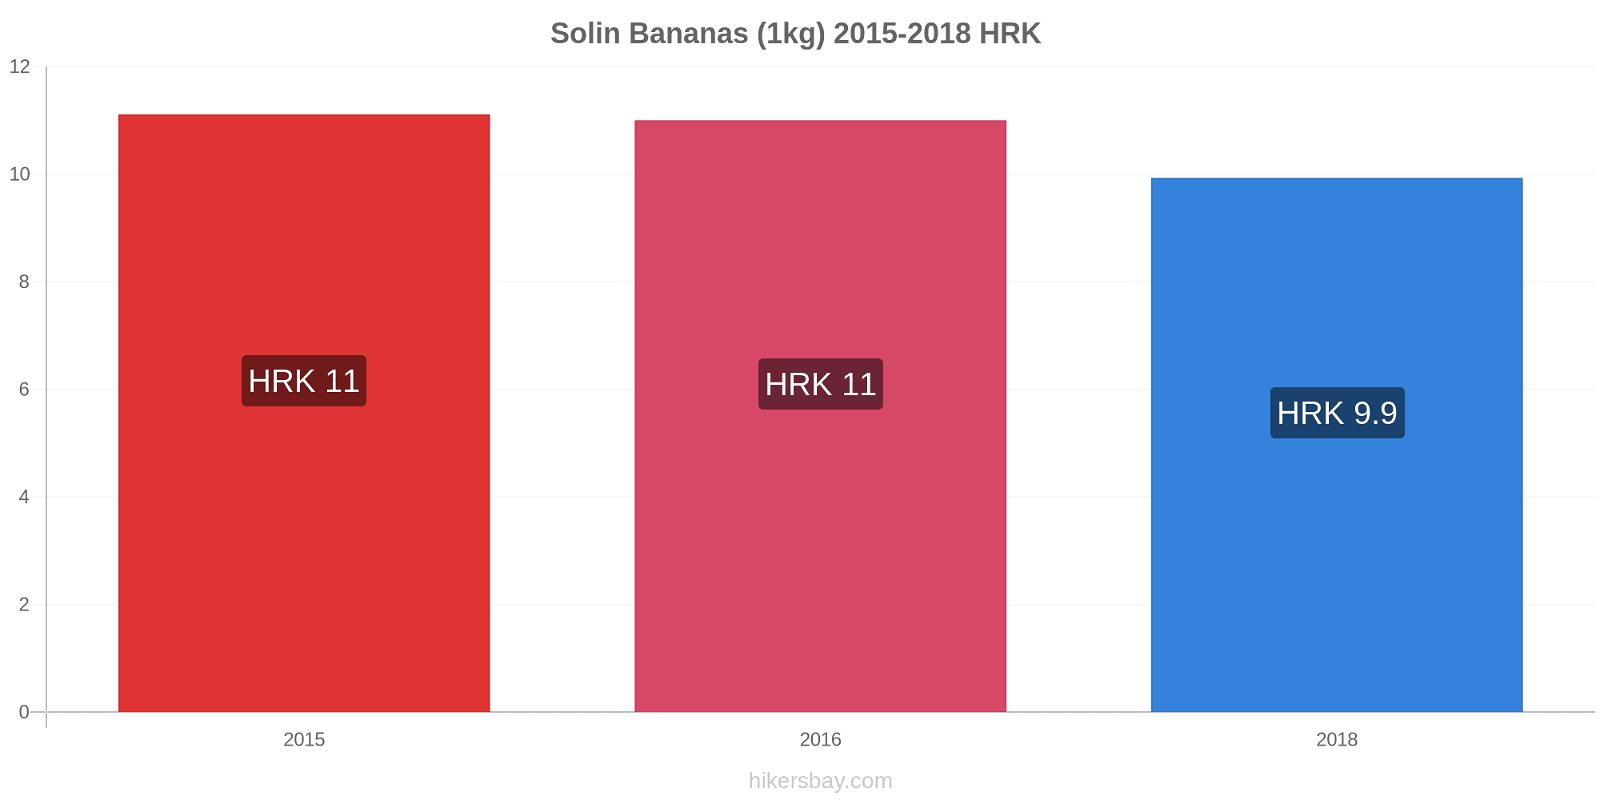 Solin price changes Bananas (1kg) hikersbay.com